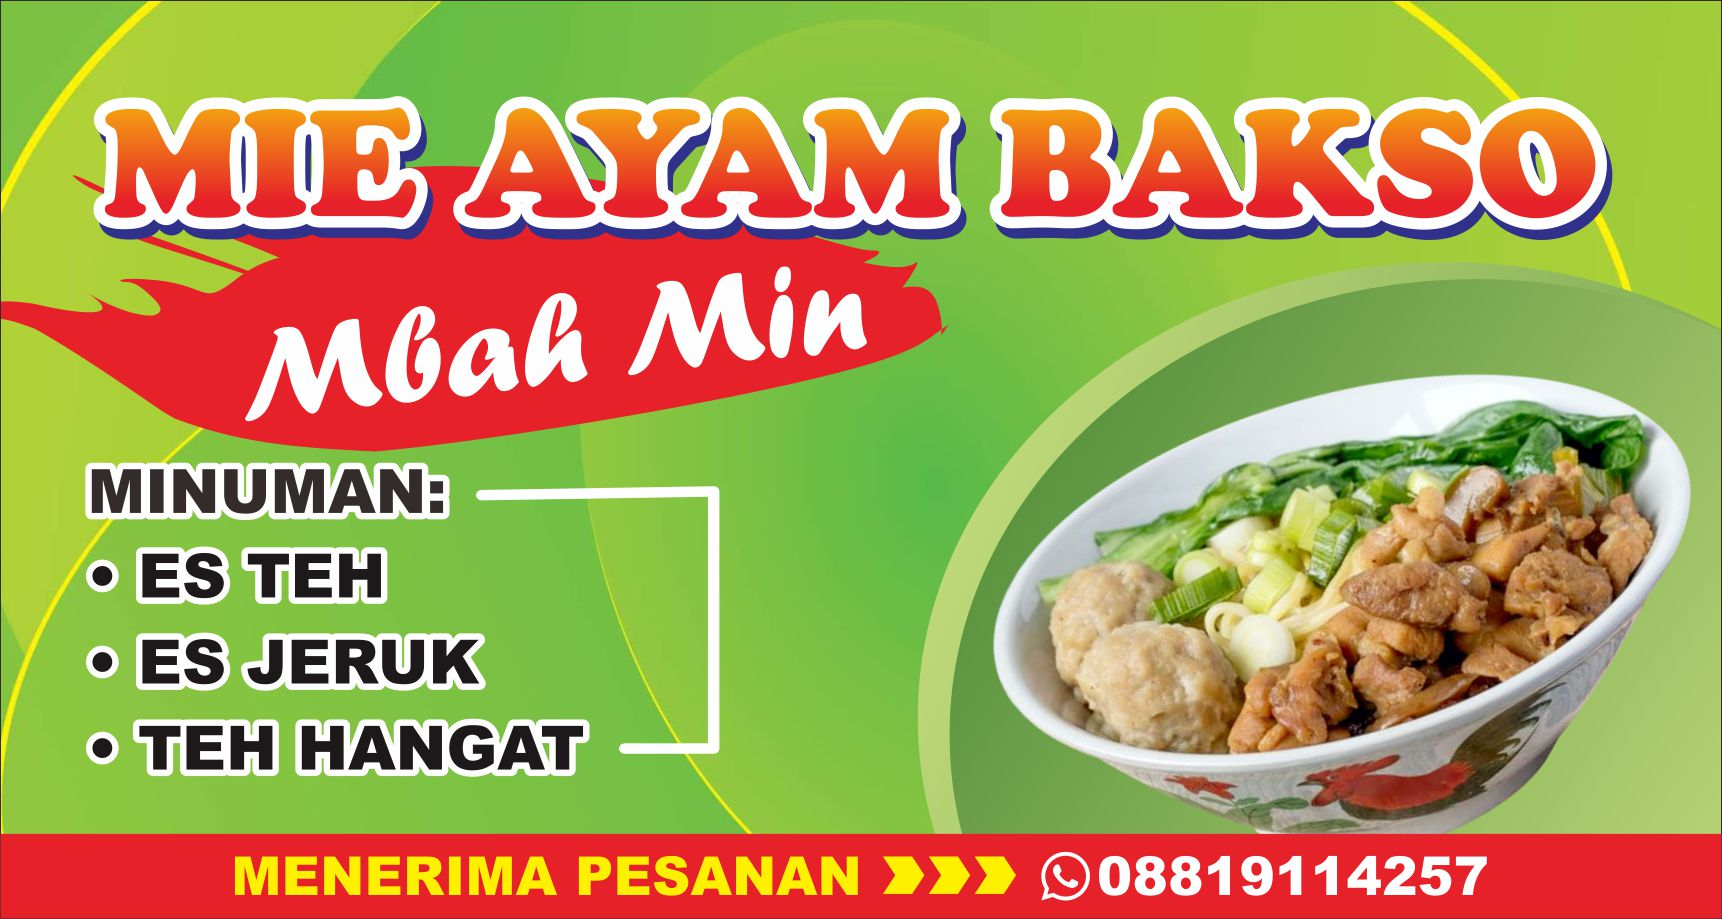 Template Desain Banner Warung Mie Ayam Bakso CDR - Mas Vian